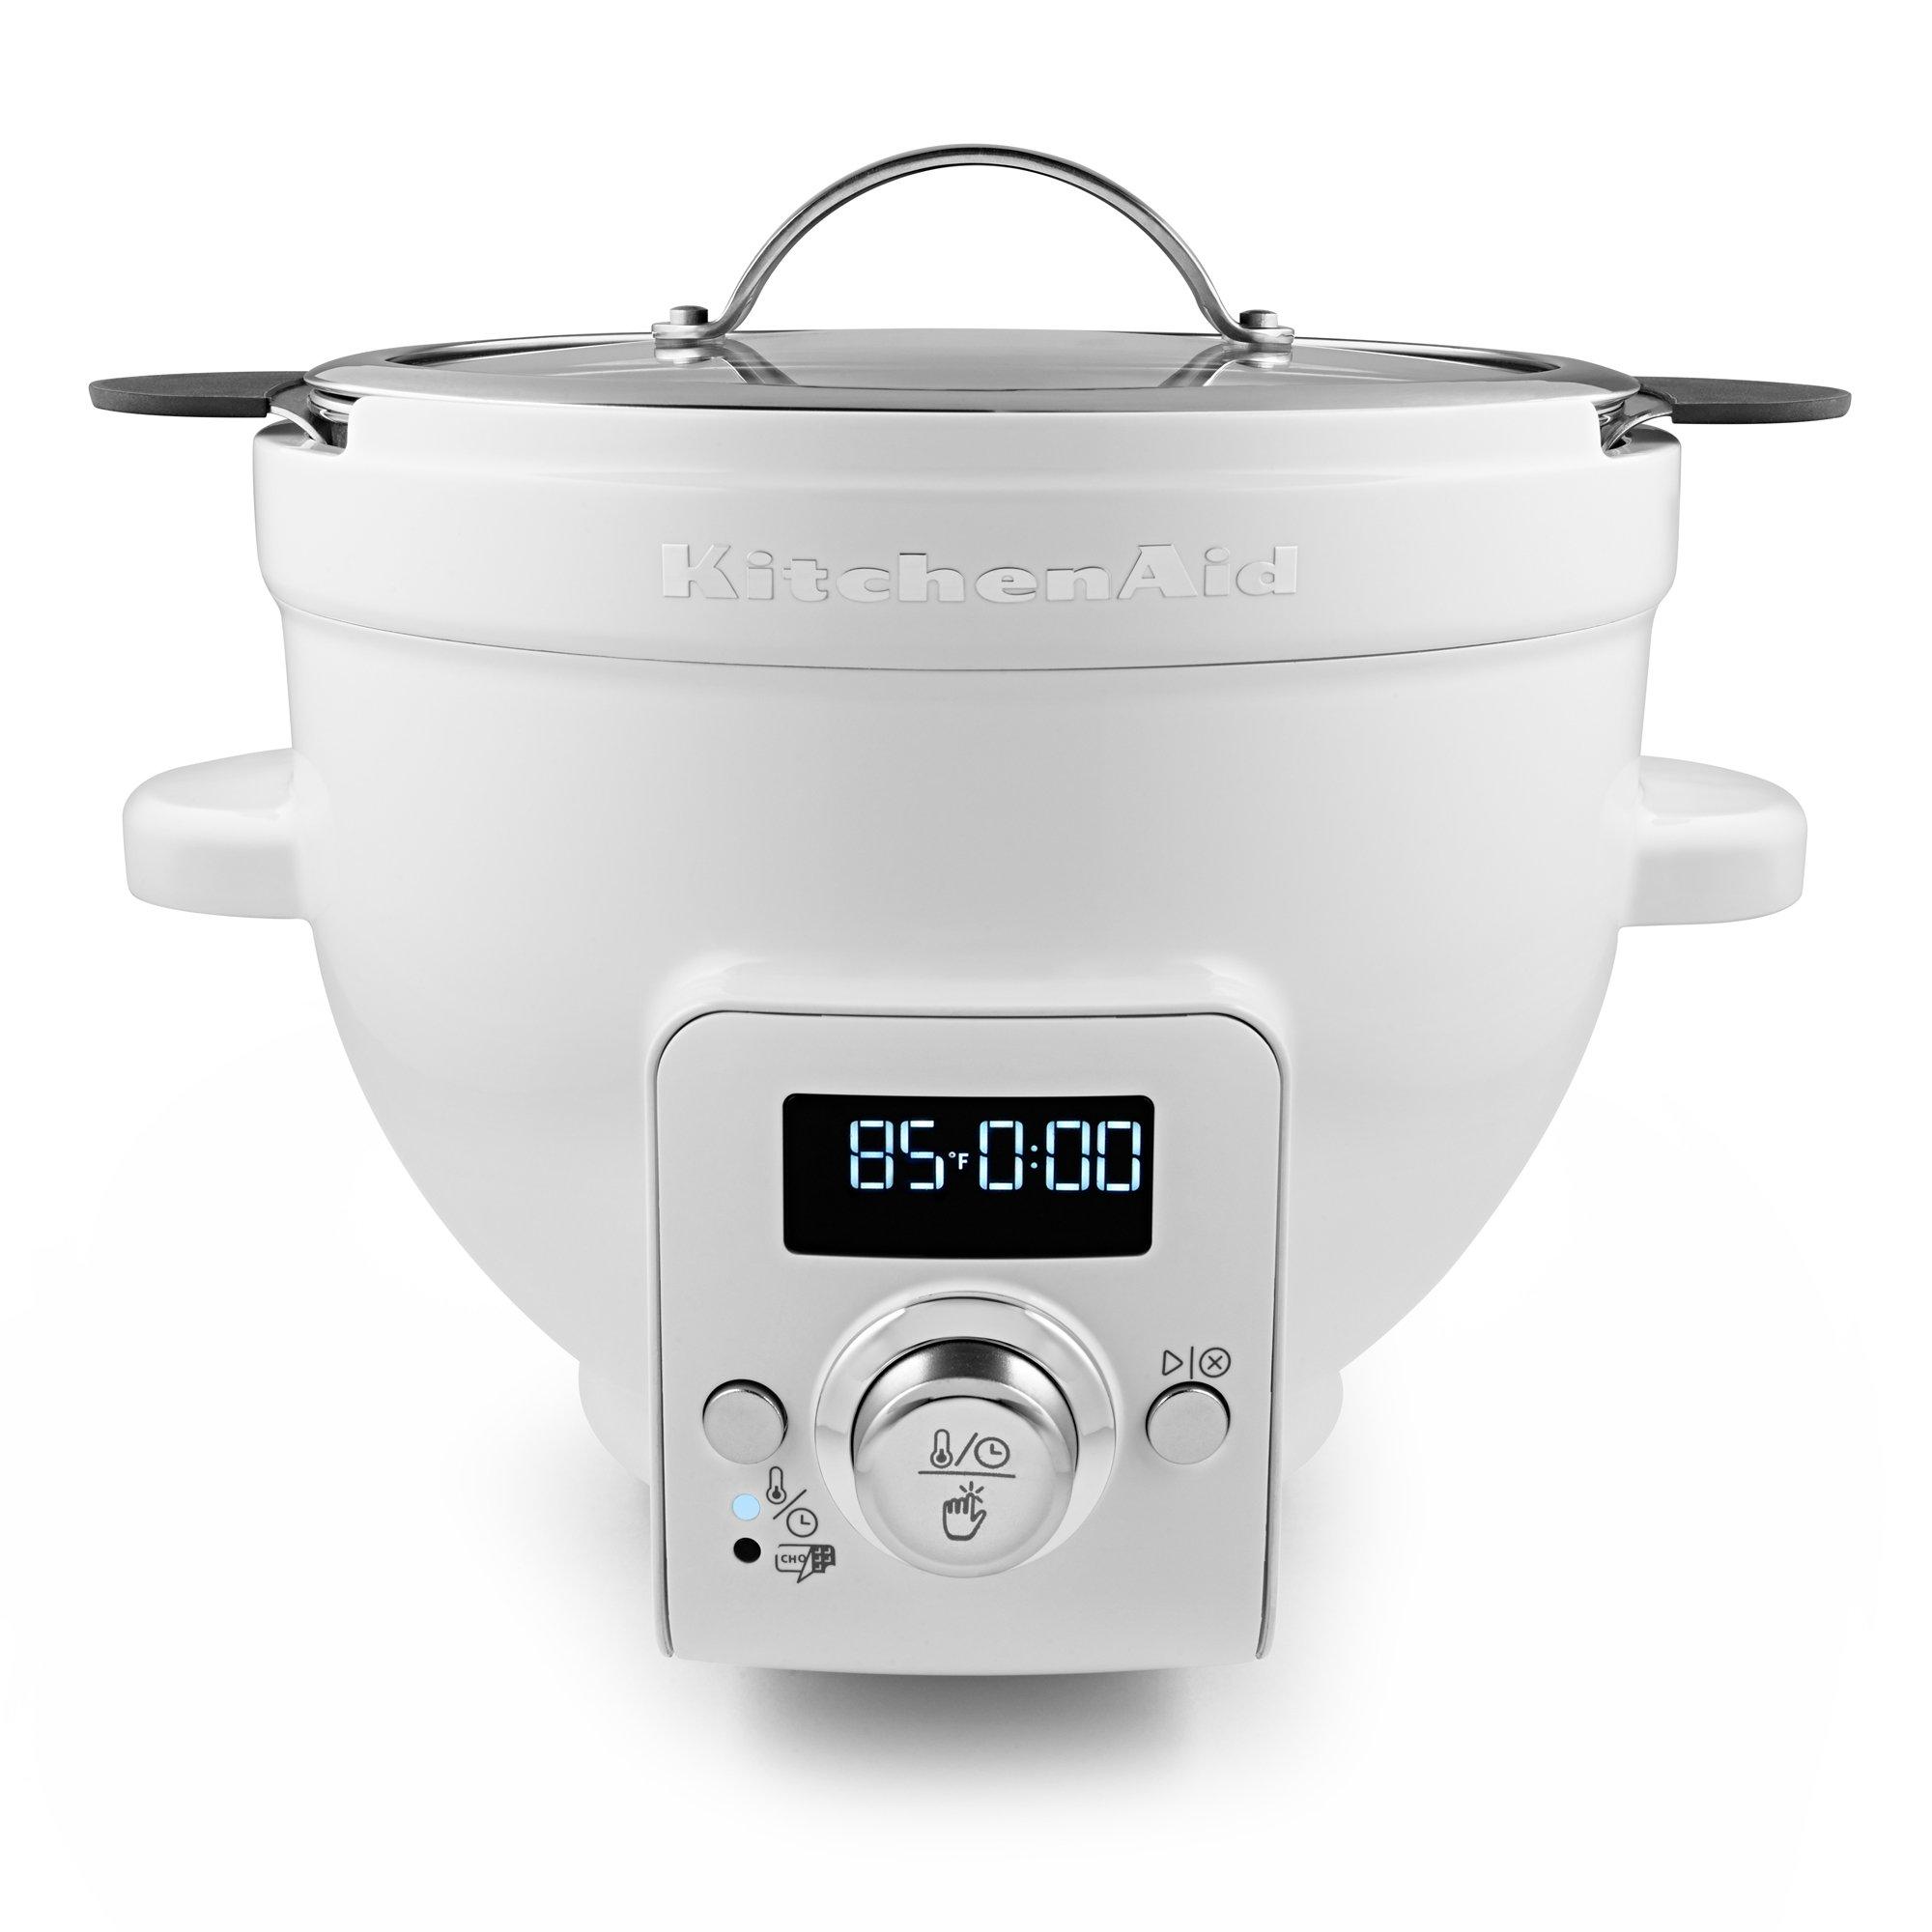 KitchenAid KSM1CBL Precise Heat Mixing Bowl For Bowl-Lift Stand Mixers by KitchenAid (Image #2)